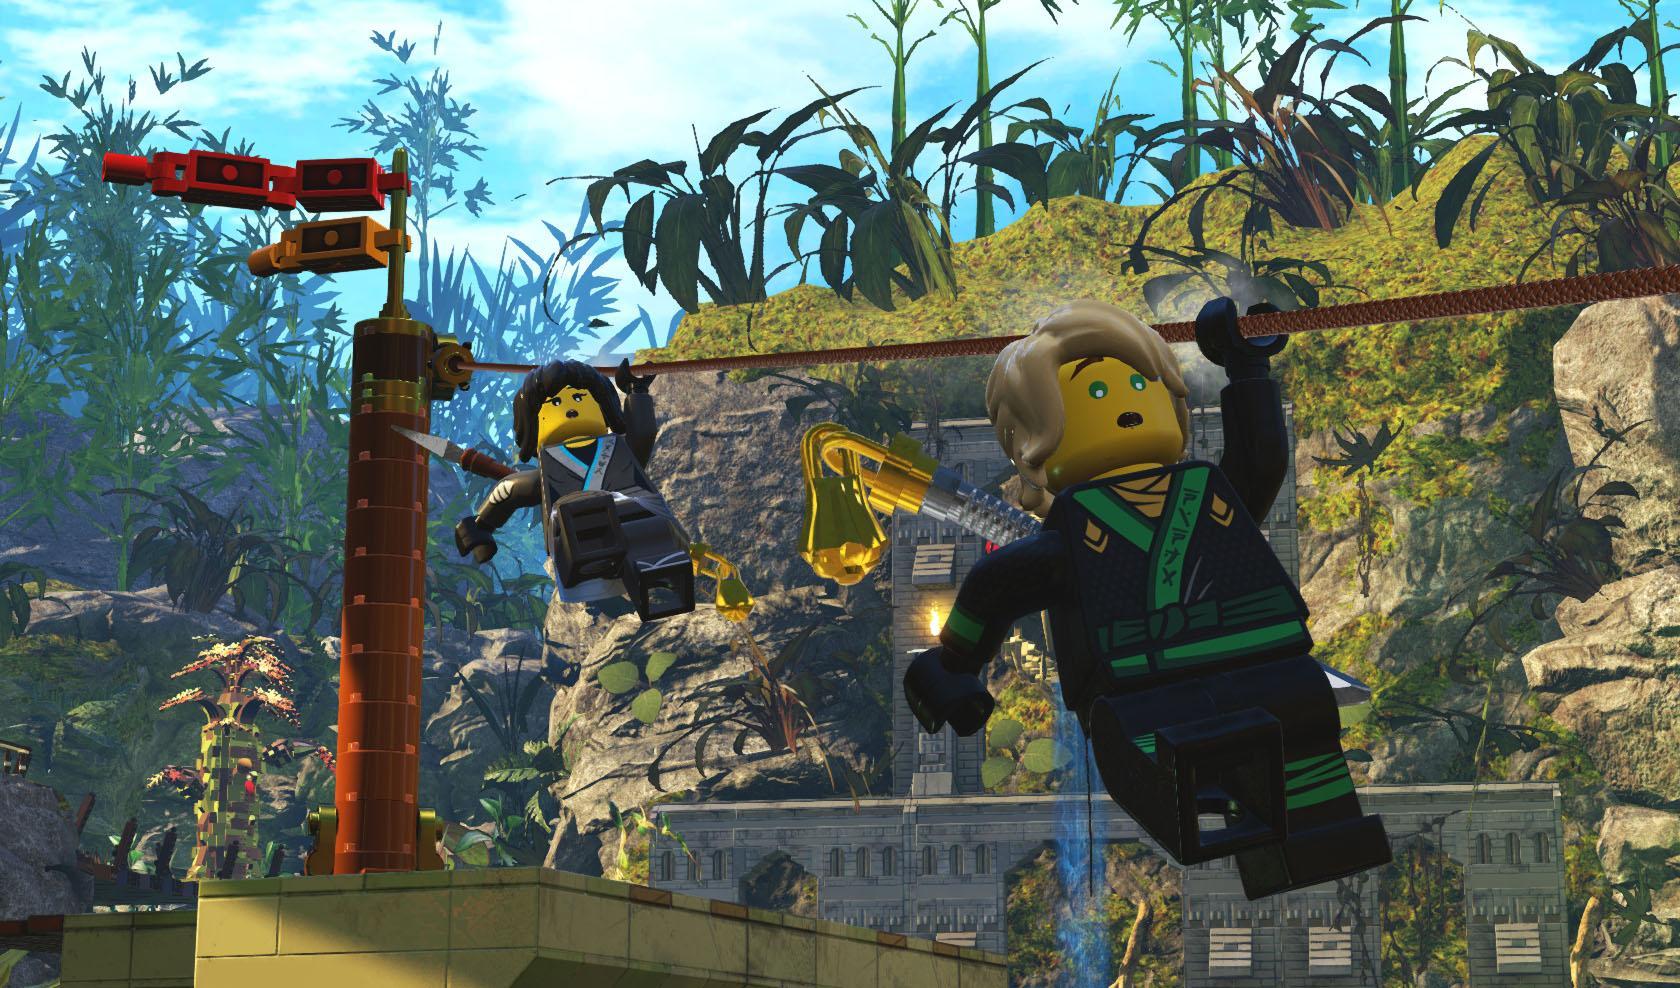 The-LEGO-Ninjago-Movie-Video-Game-3.jpg